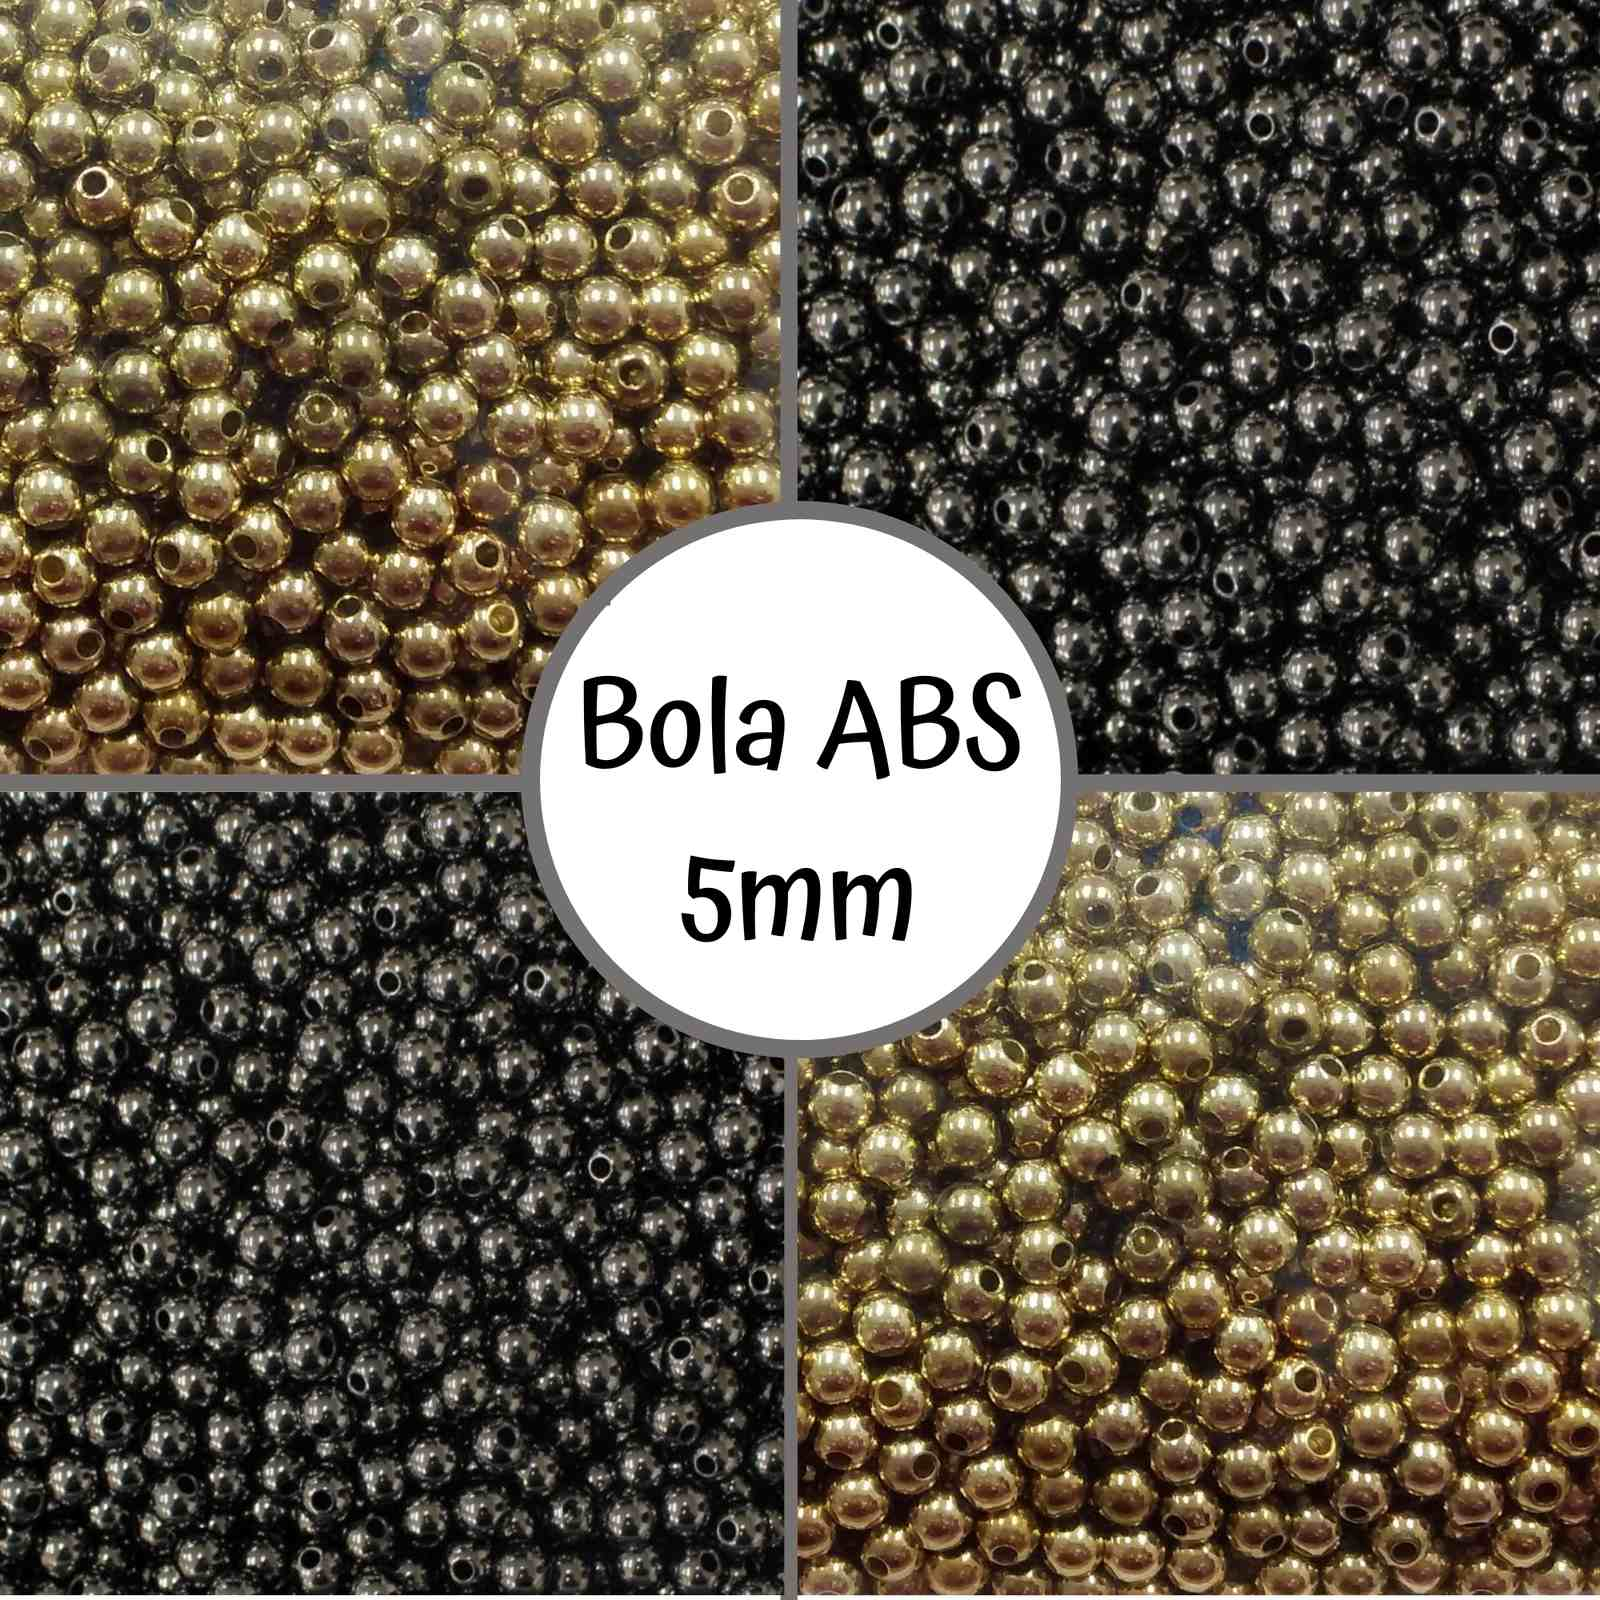 Bola ABS Metalizada 5mm - 500g